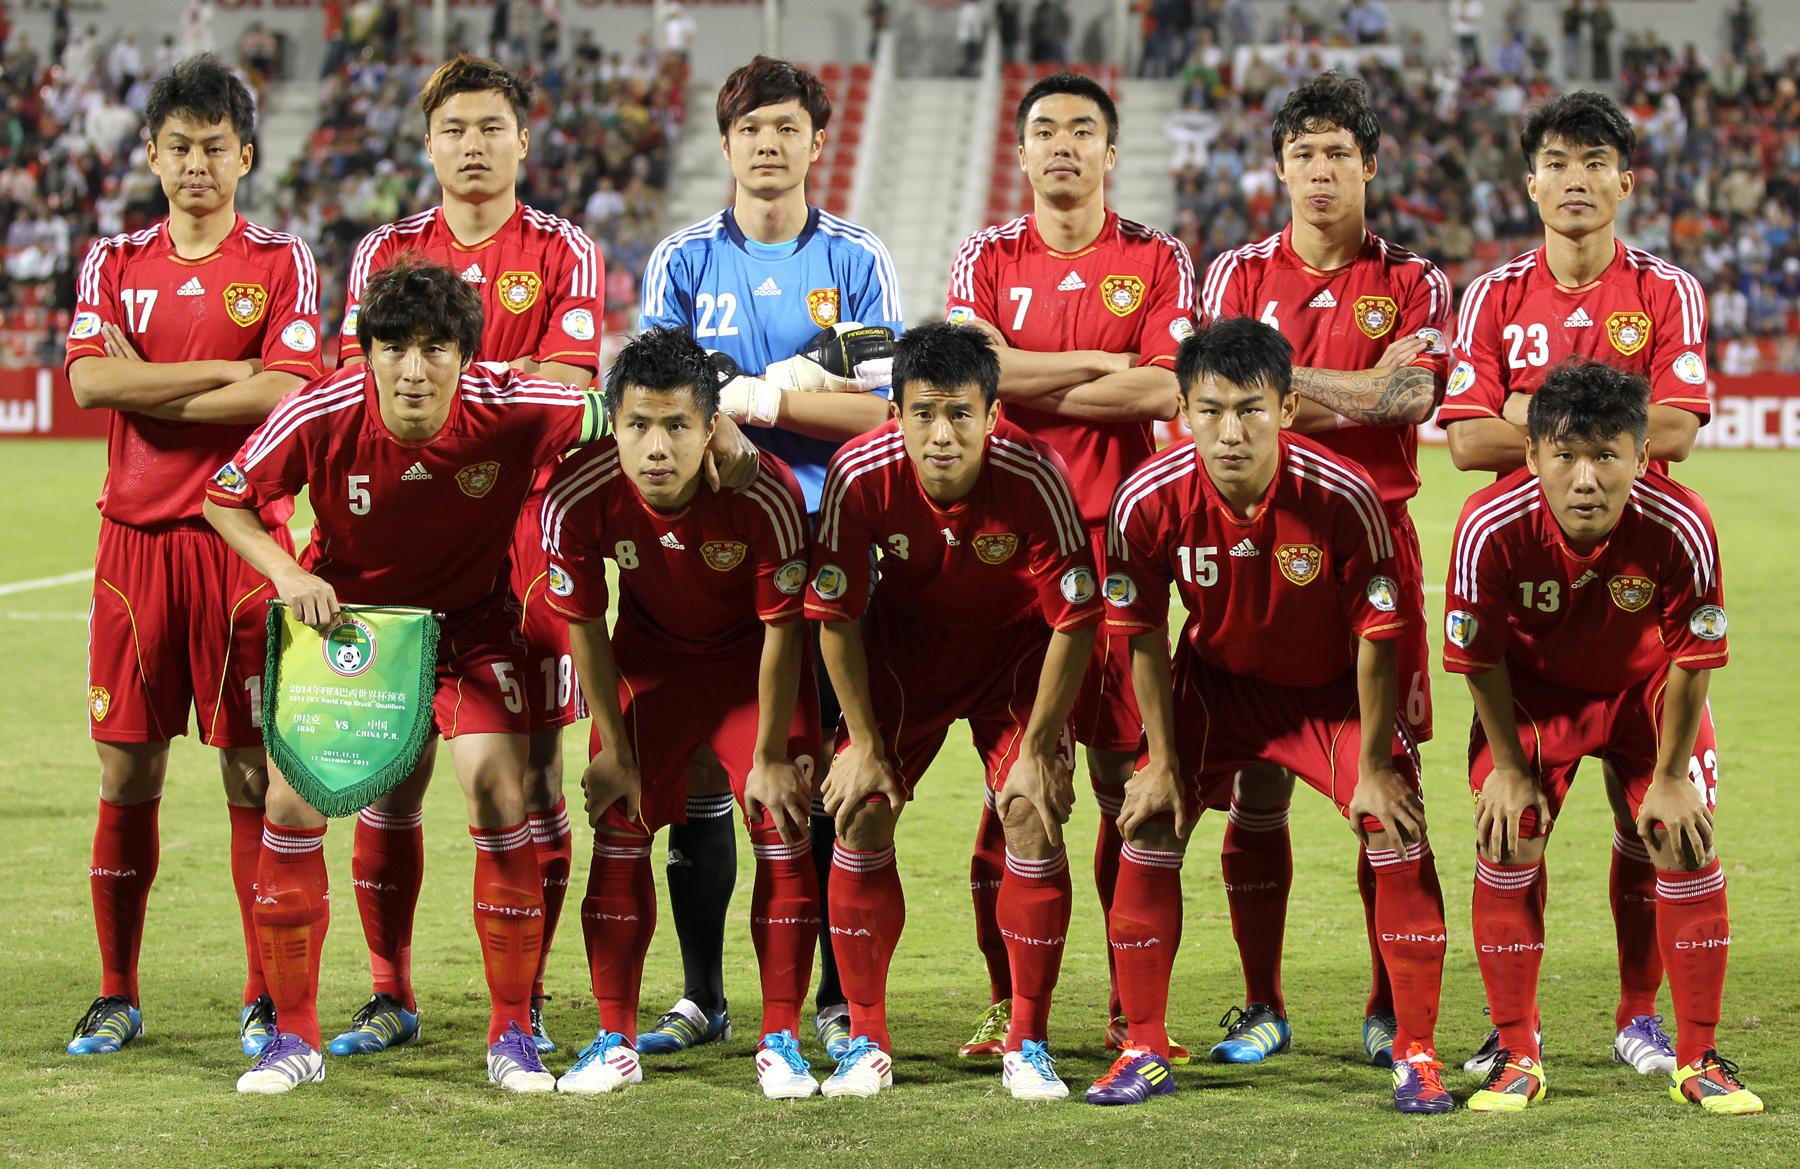 China: The Future of world Football?